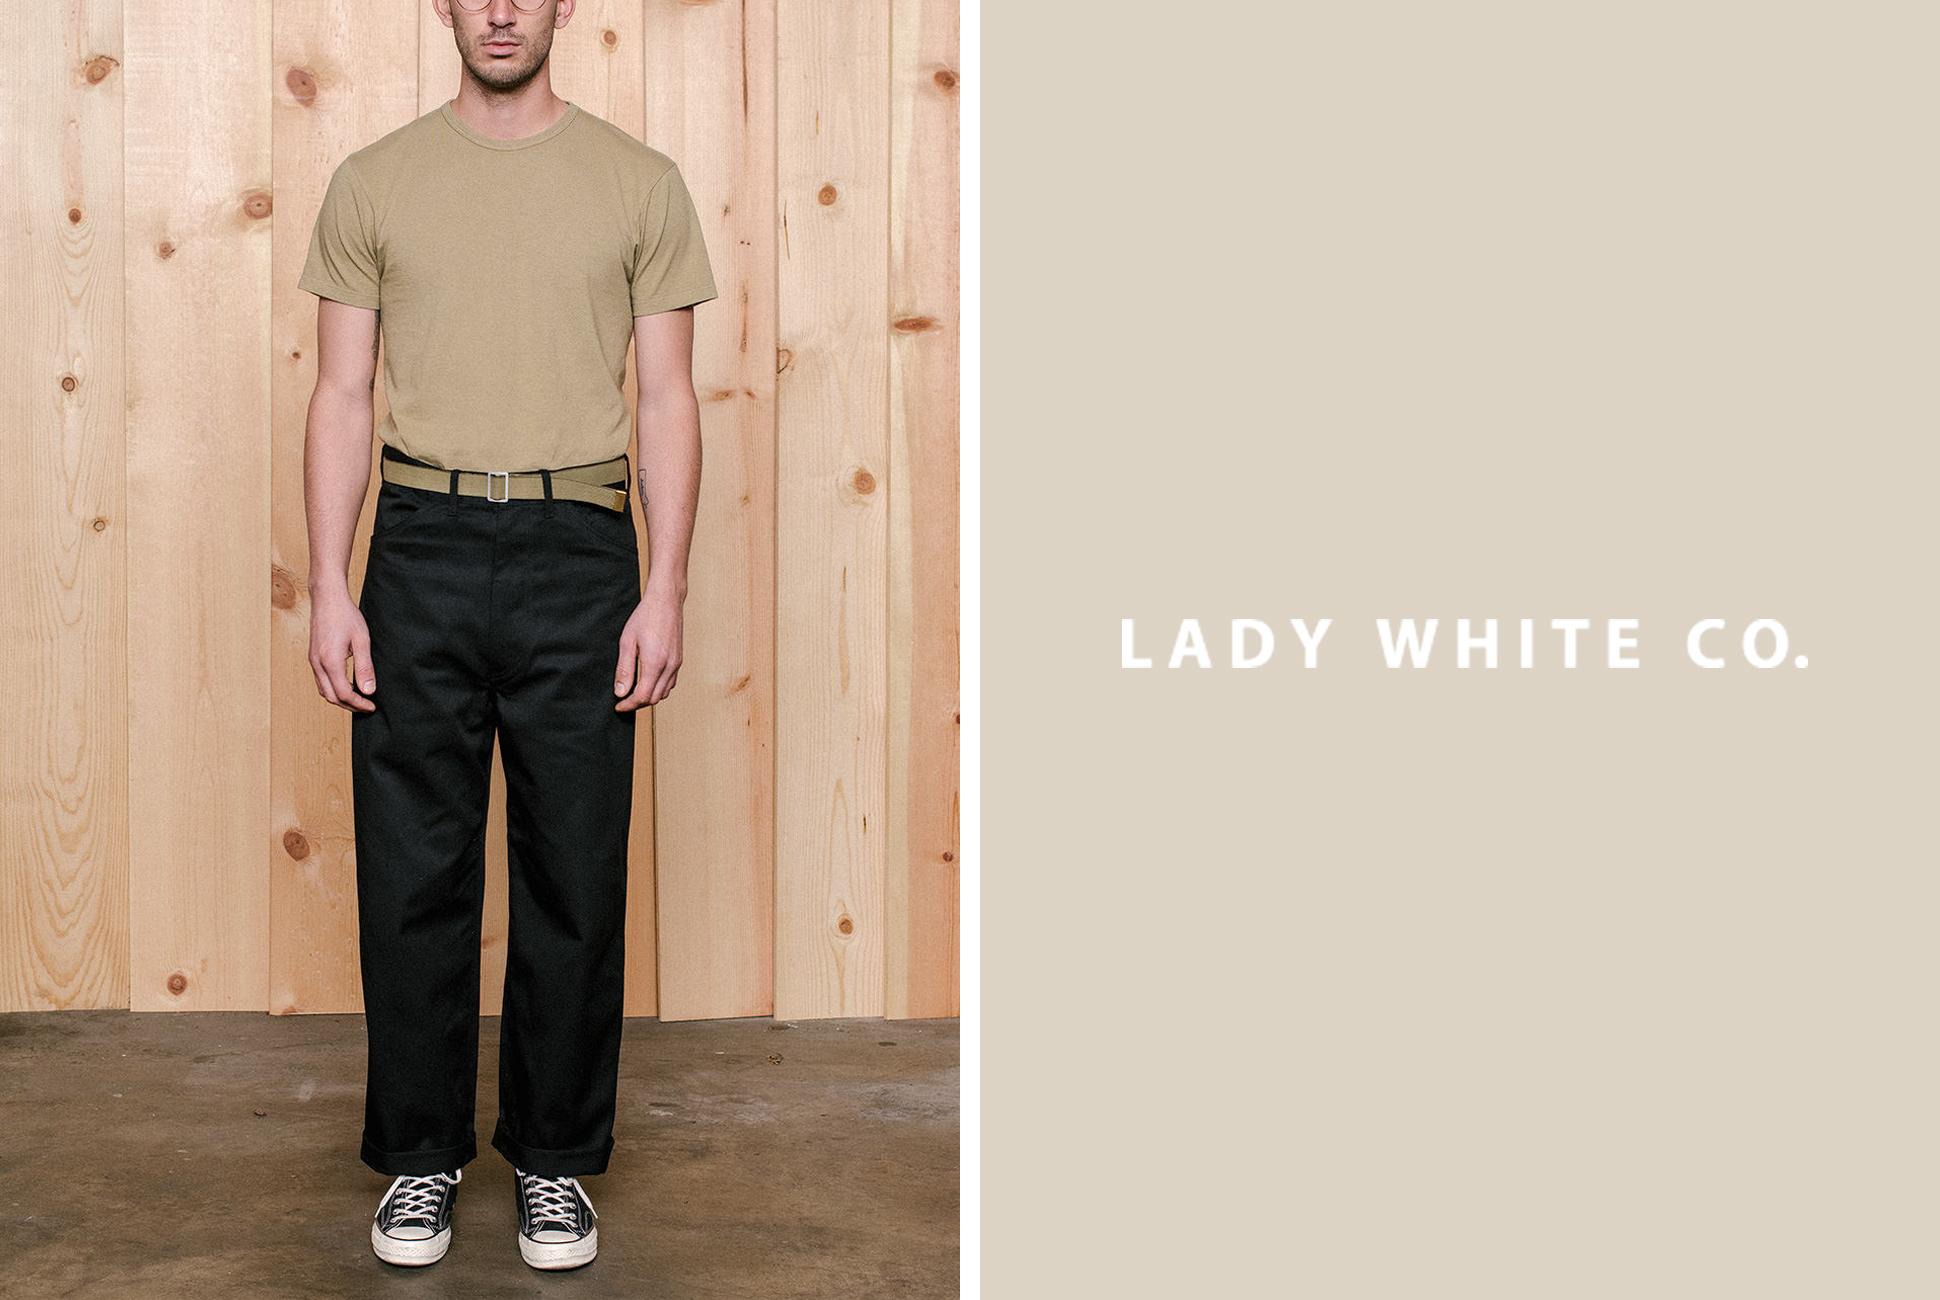 gear-patrol-tee-brands-to-know-ladywhite